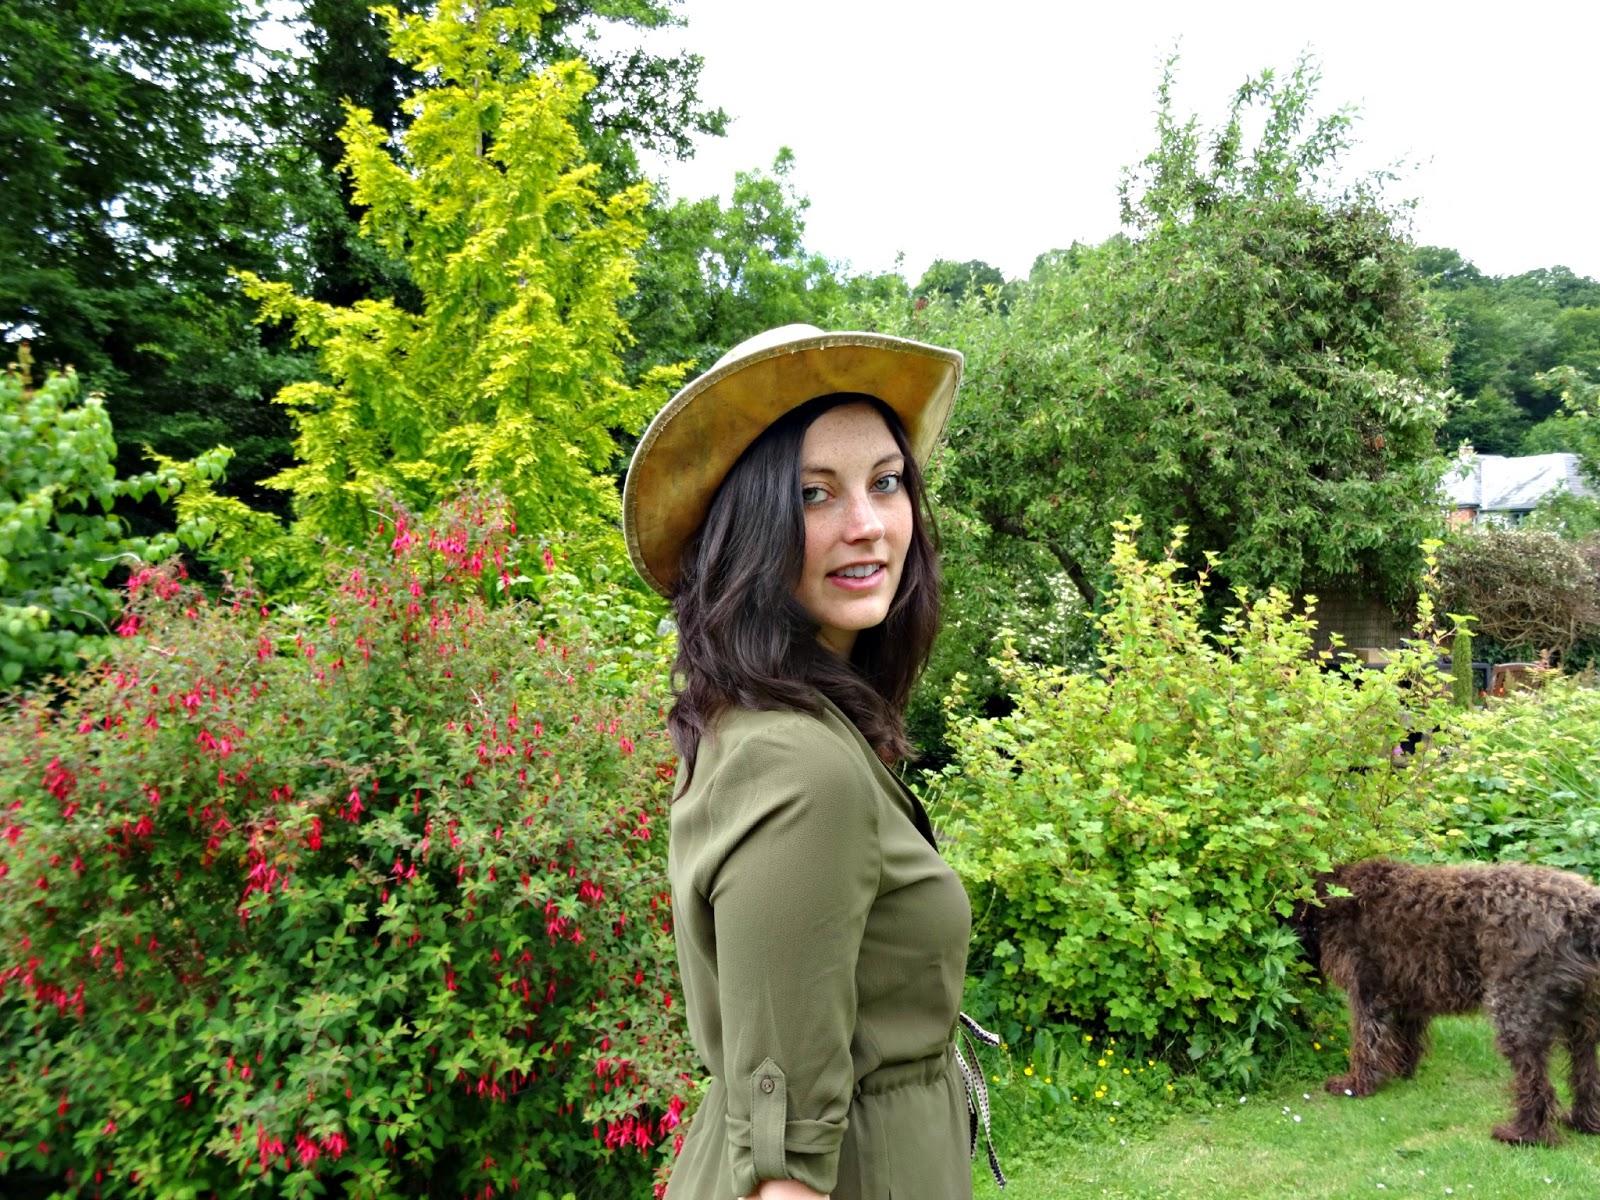 Glastonbury festival wear